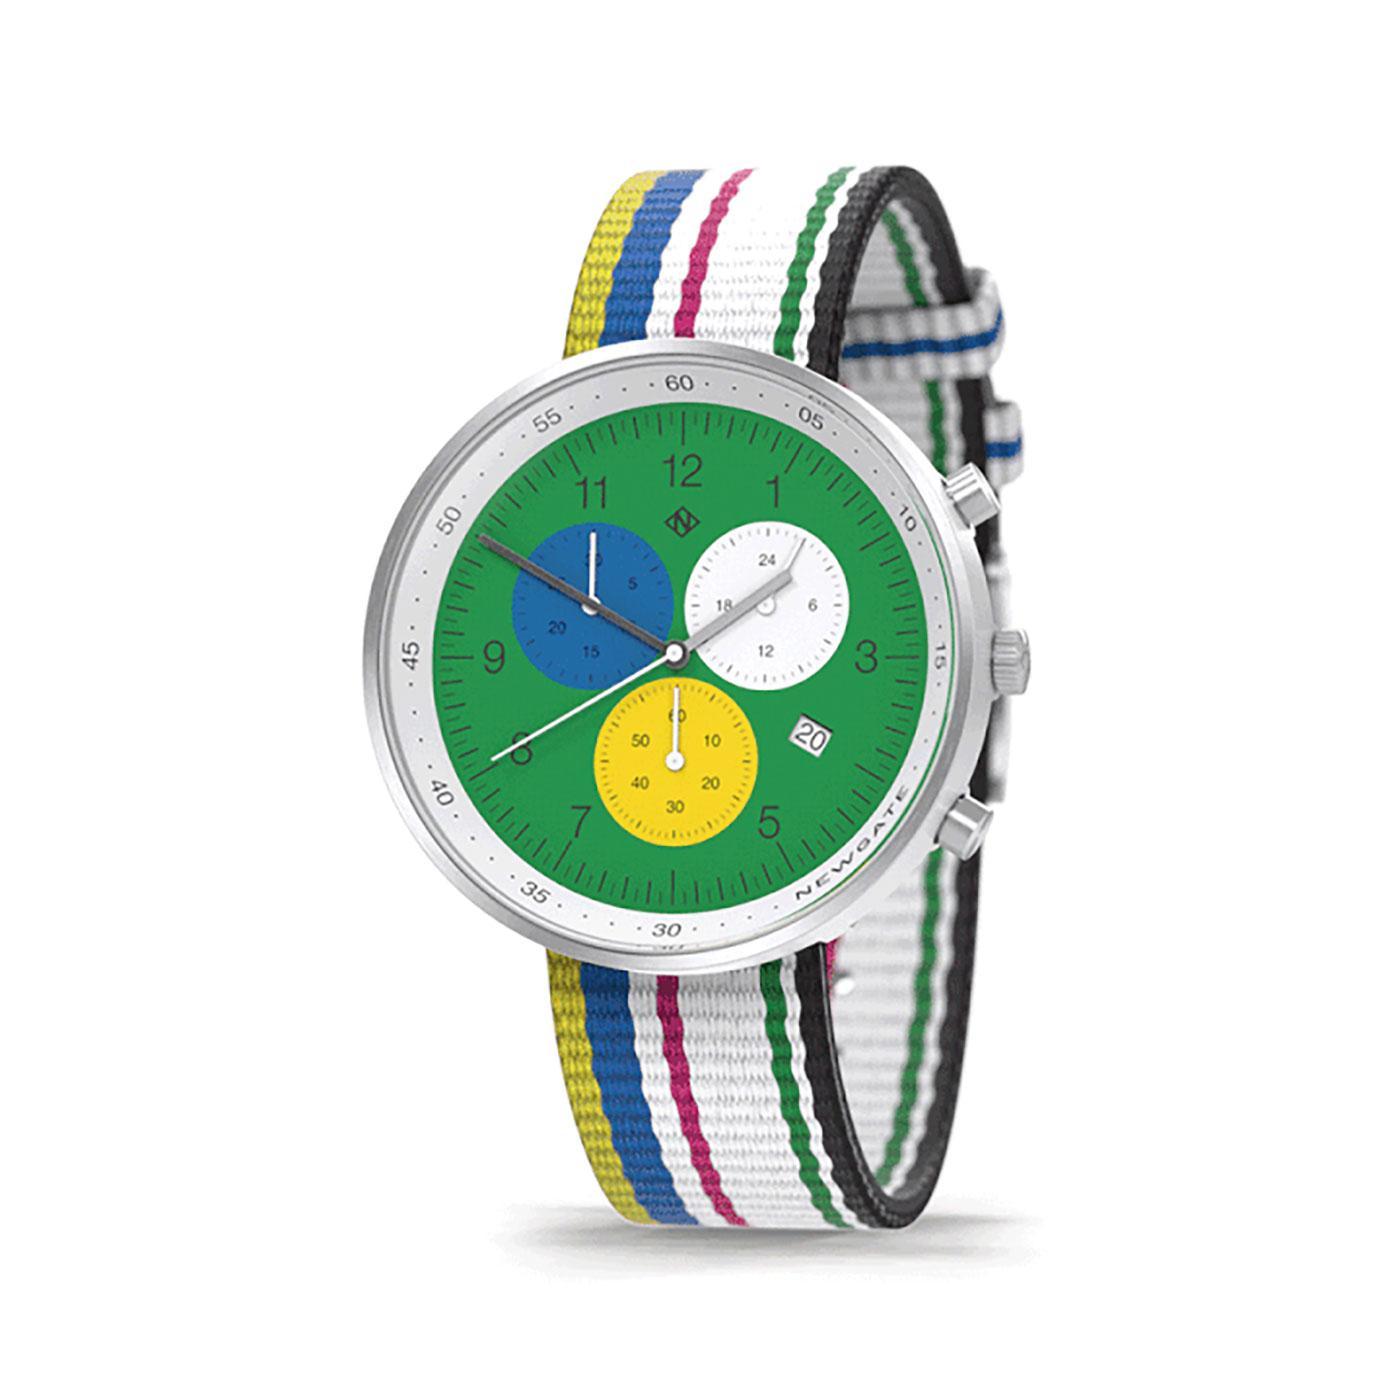 G6 Kingston NEWGATE CLOCKS Retro Chronograph Watch